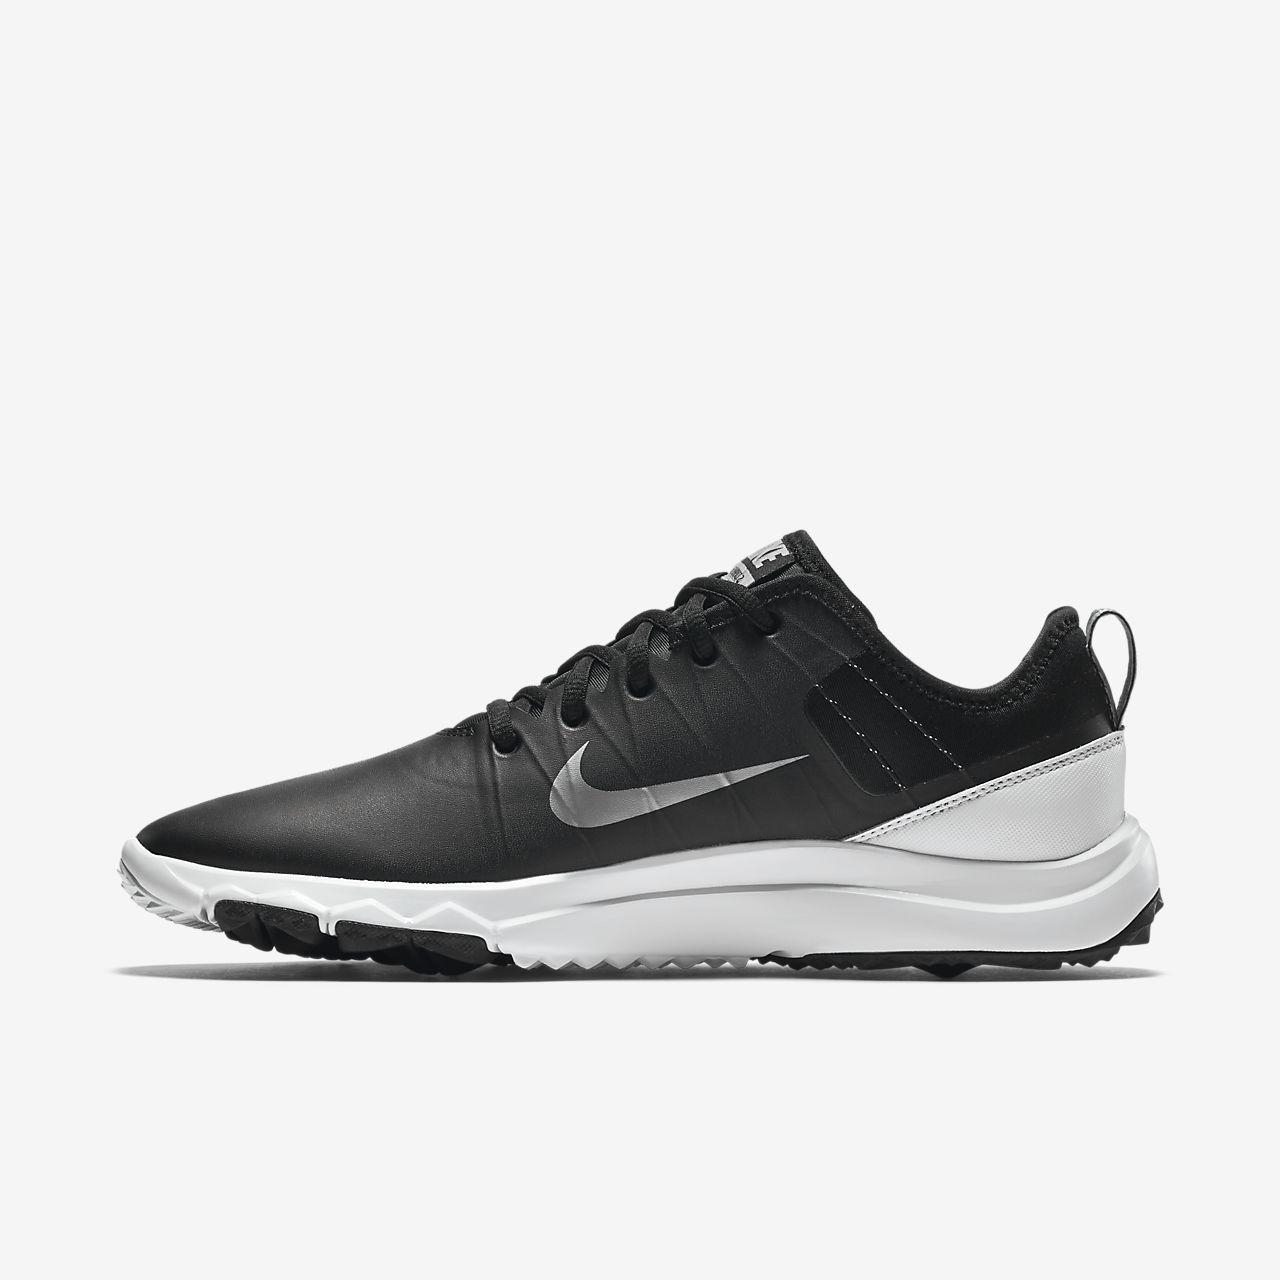 buy online 971c2 dd823 ... Nike FI Impact 2 Women s Golf Shoe